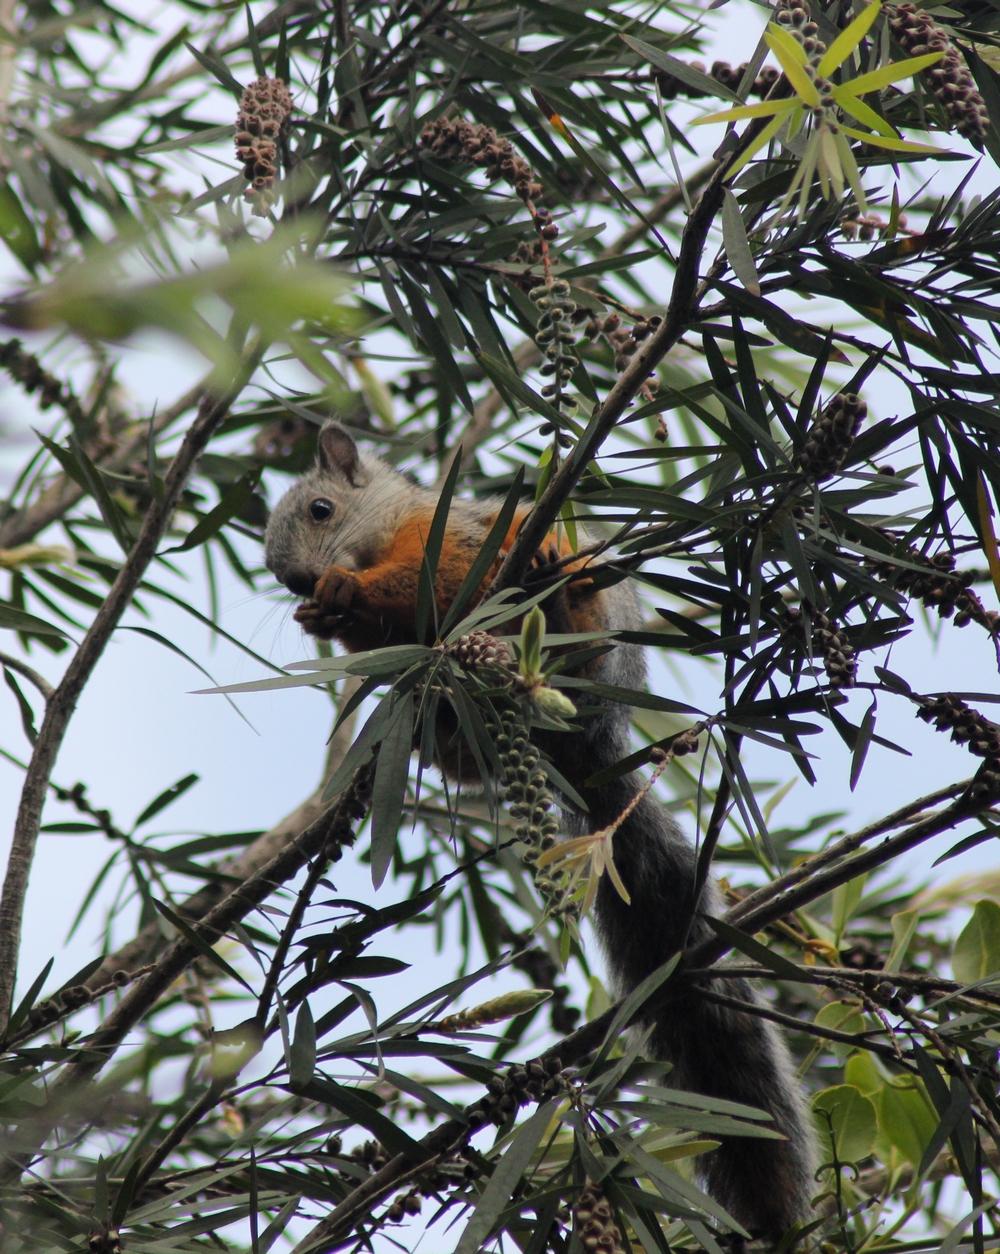 15 jours dans la jungle du Costa Rica 808442ecu2r